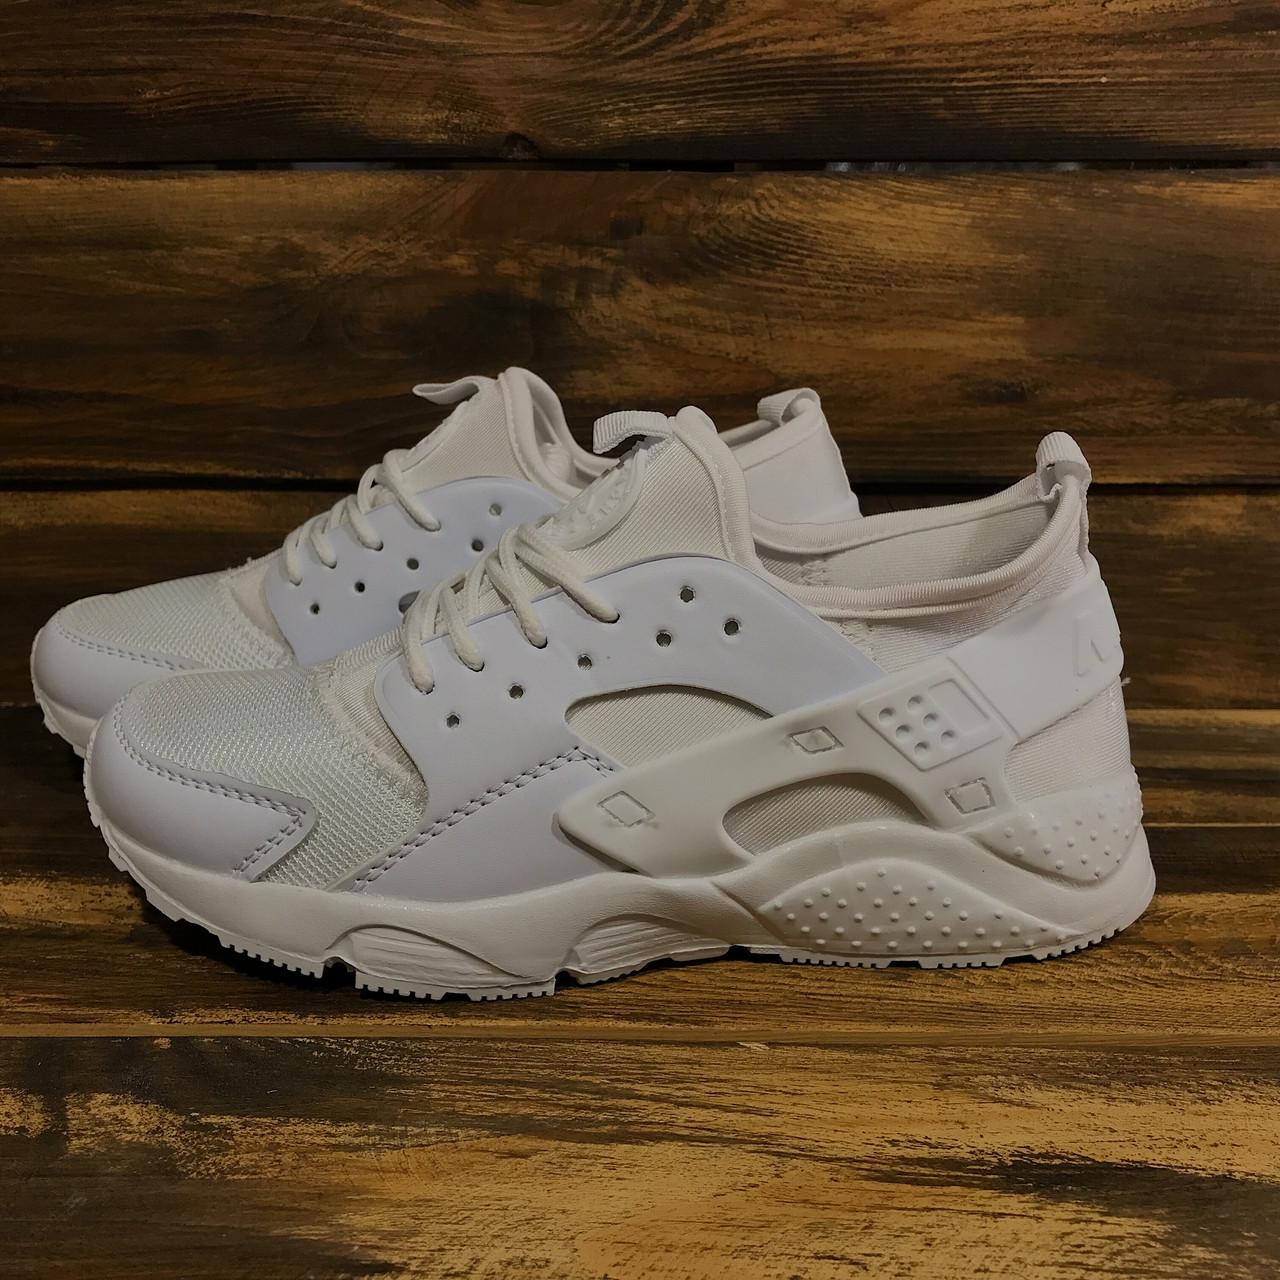 new styles 5d043 b5e19 Кроссовки женские Nike Huarache 36, 37 (реплика) 00031